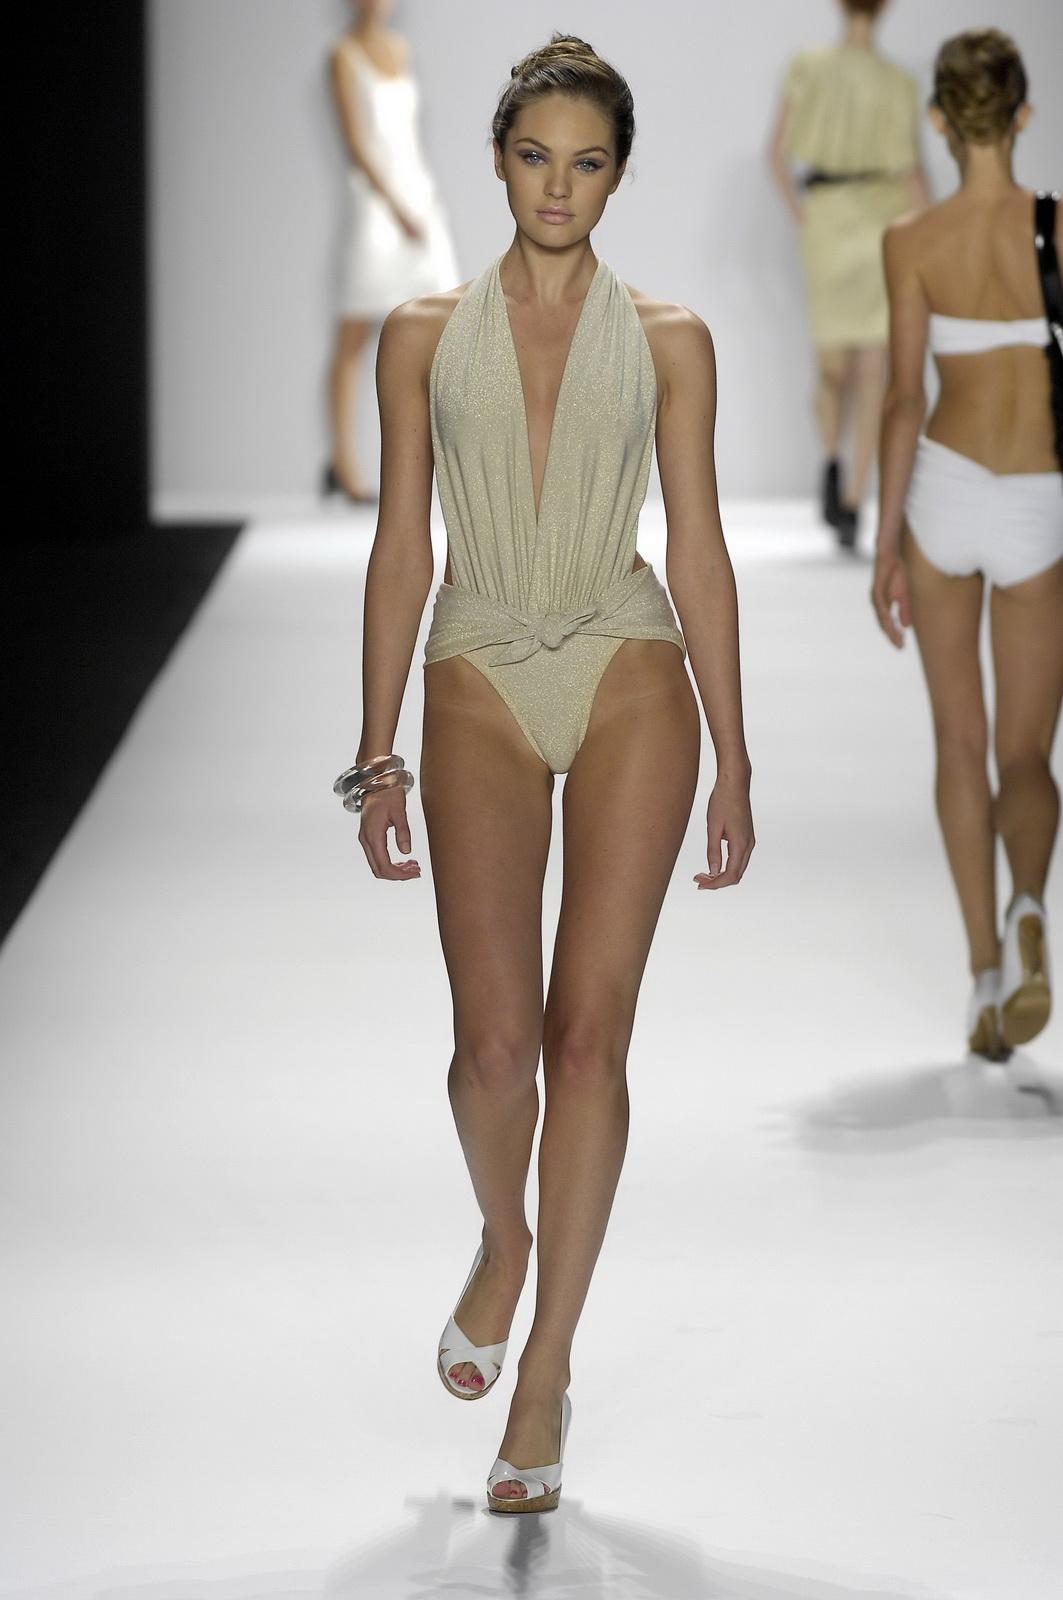 http://4.bp.blogspot.com/_NRGPIrDtEg8/TQsbZ3CXZhI/AAAAAAAAAXw/TmgMSGYPdkM/s1600/Candice_Swanepoel_supery_Bathing_Suit_6.jpg